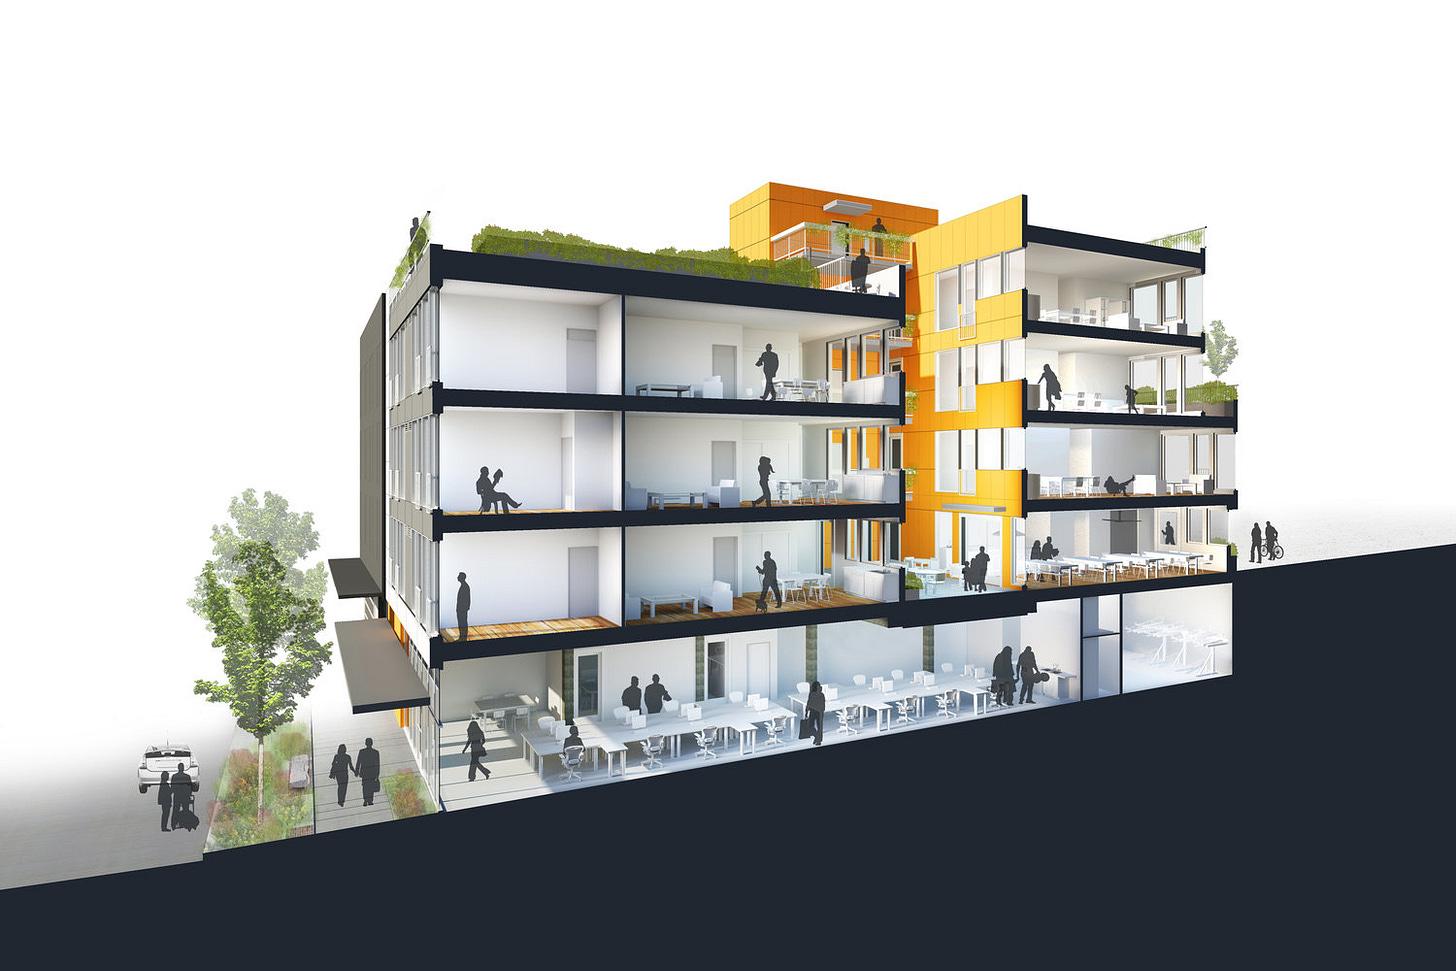 Building Design at Capitol Hill Urban Cohousing (credit: Schemata Workshop)